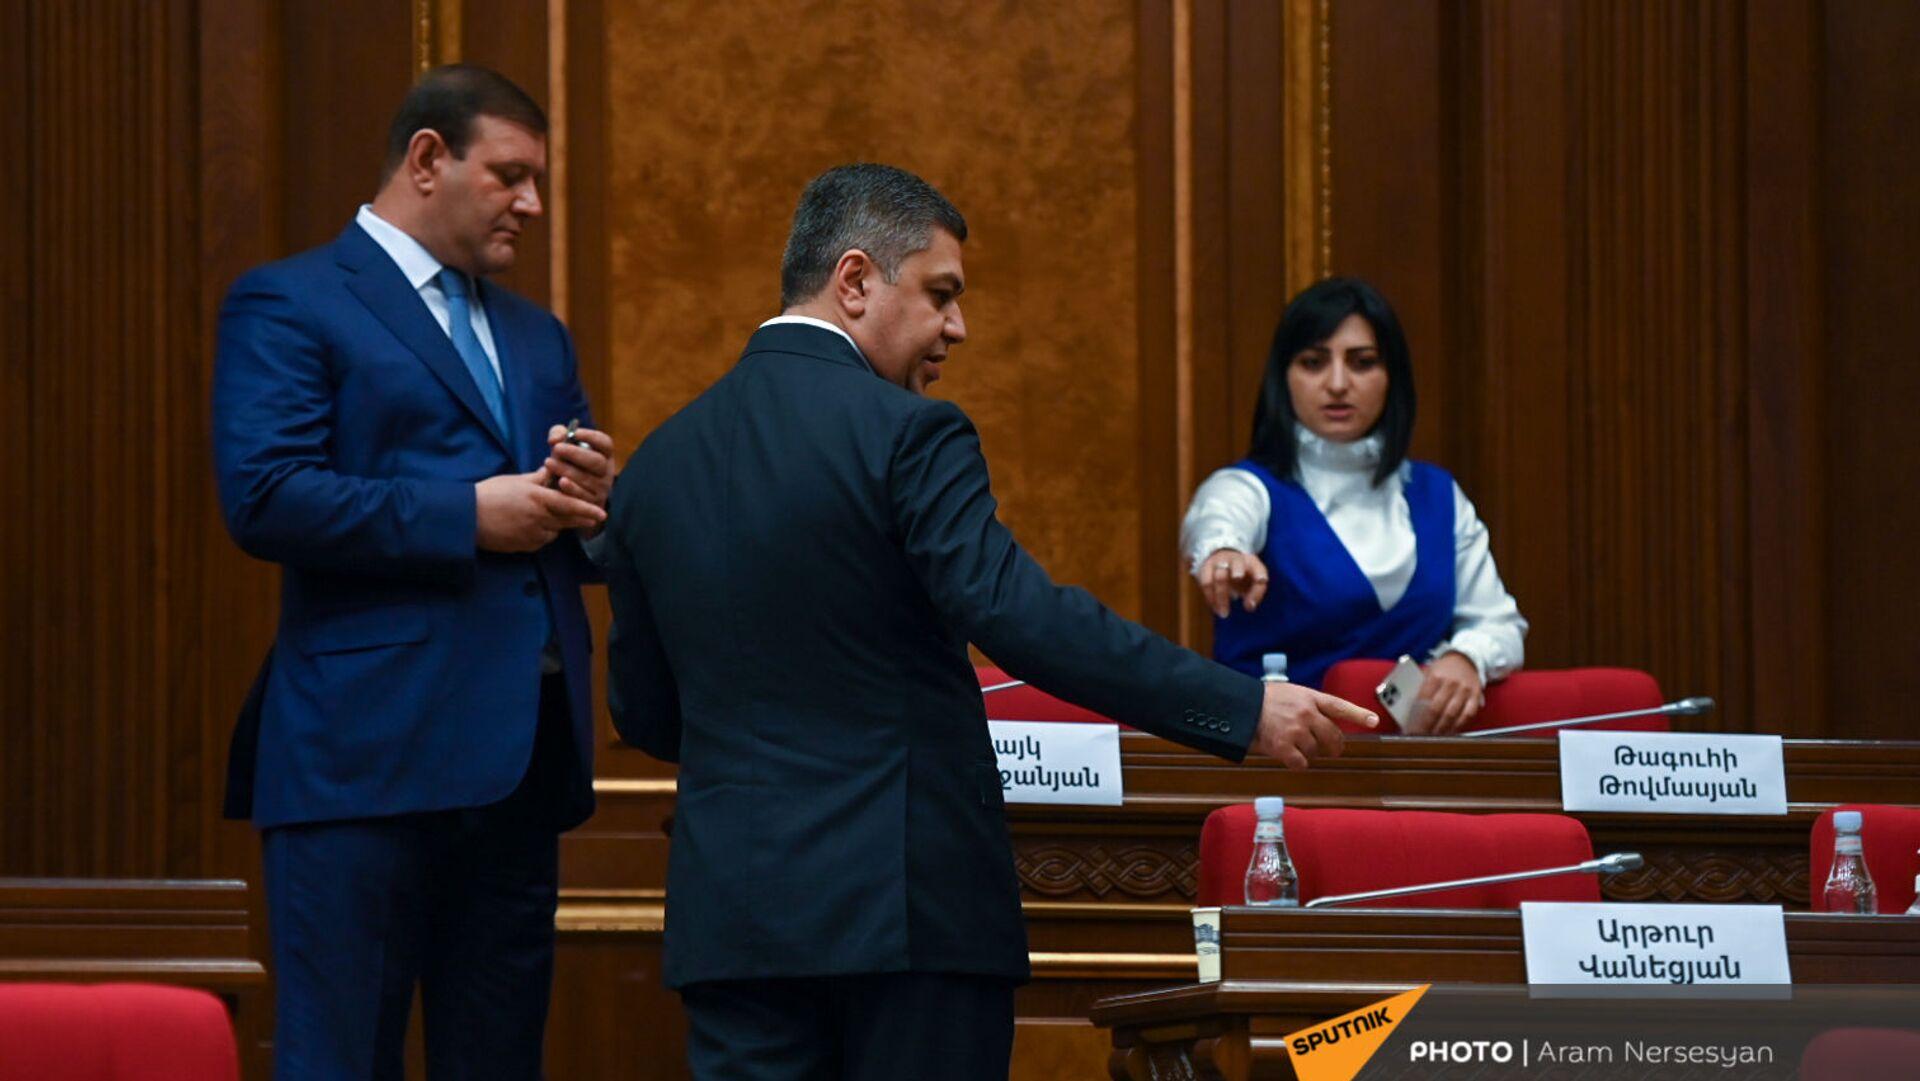 Тарон Маргарян, Артур Ванецян и Тагуи Товмасян перед началом первого заседания парламента Армении 8-го созыва (2 августа 2021). Еревaн - Sputnik Армения, 1920, 17.09.2021